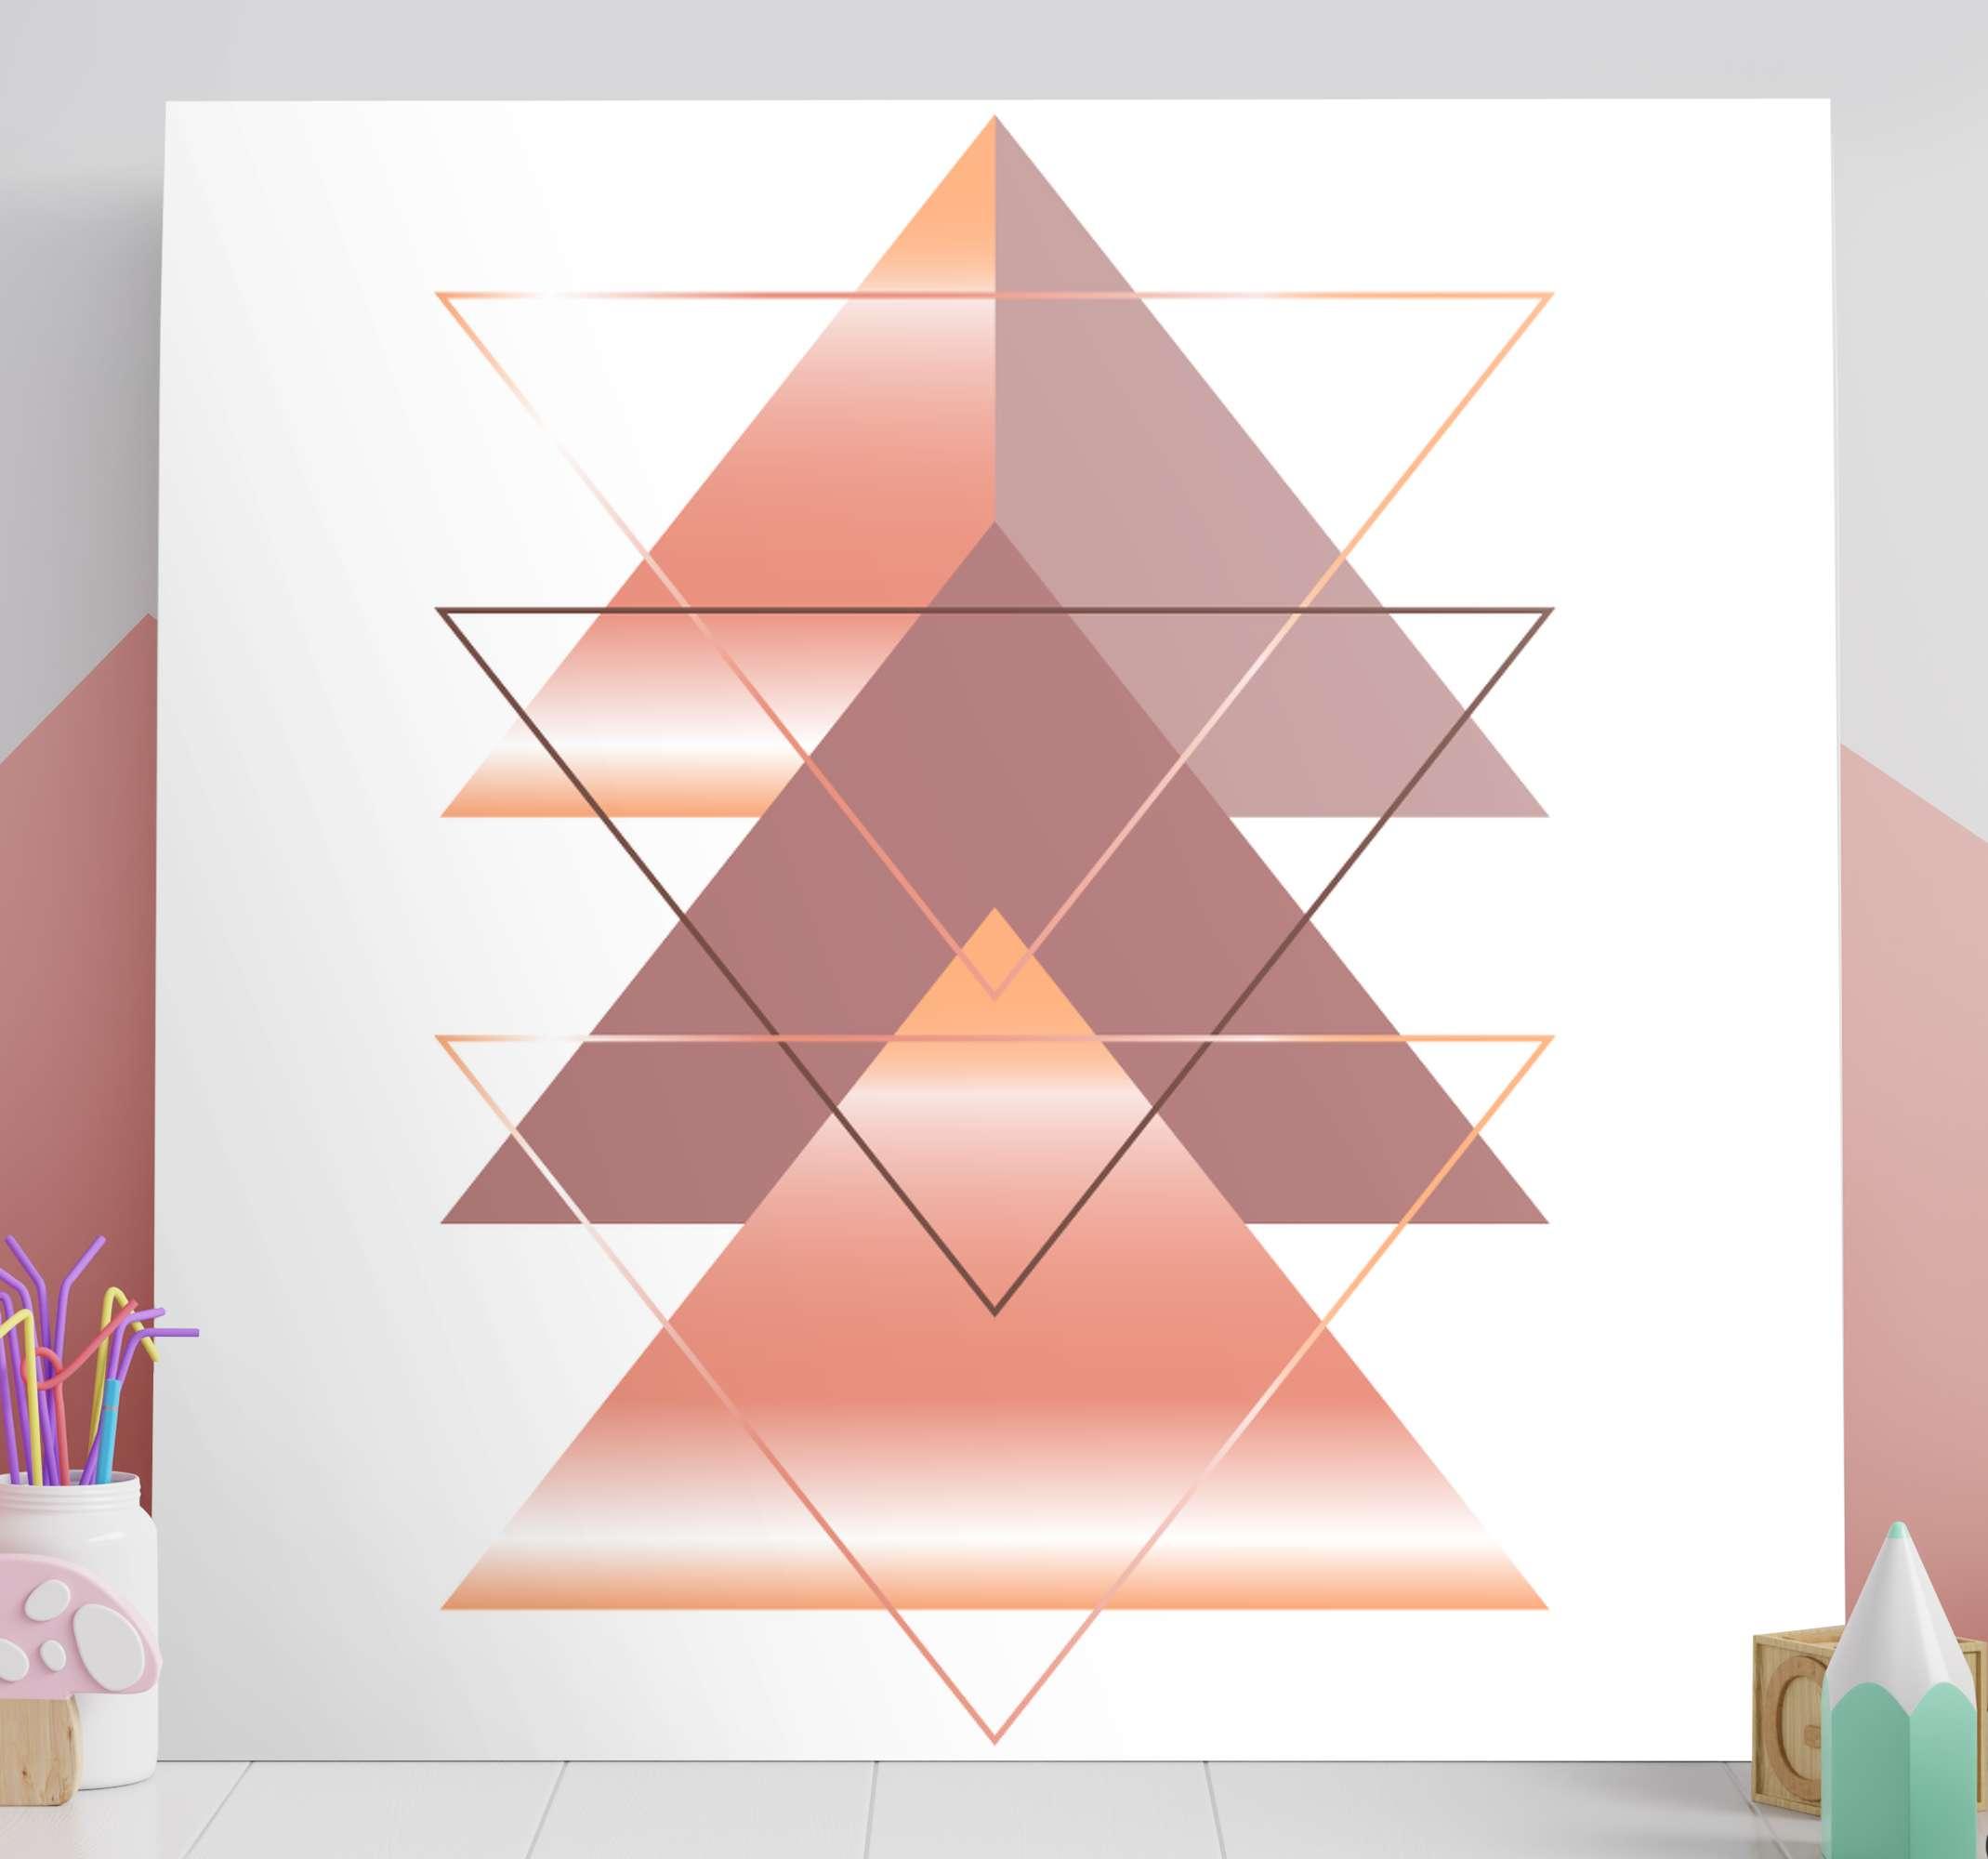 TenStickers. τρίπτυχο σκανδιναβικό καμβά. Triptych nordic art prints για διακόσμηση χώρου γραφείου. μπορείτε να επιλέξετε να διακοσμήσετε τον καμβά σε οποιονδήποτε άλλο χώρο που σας ταιριάζει.